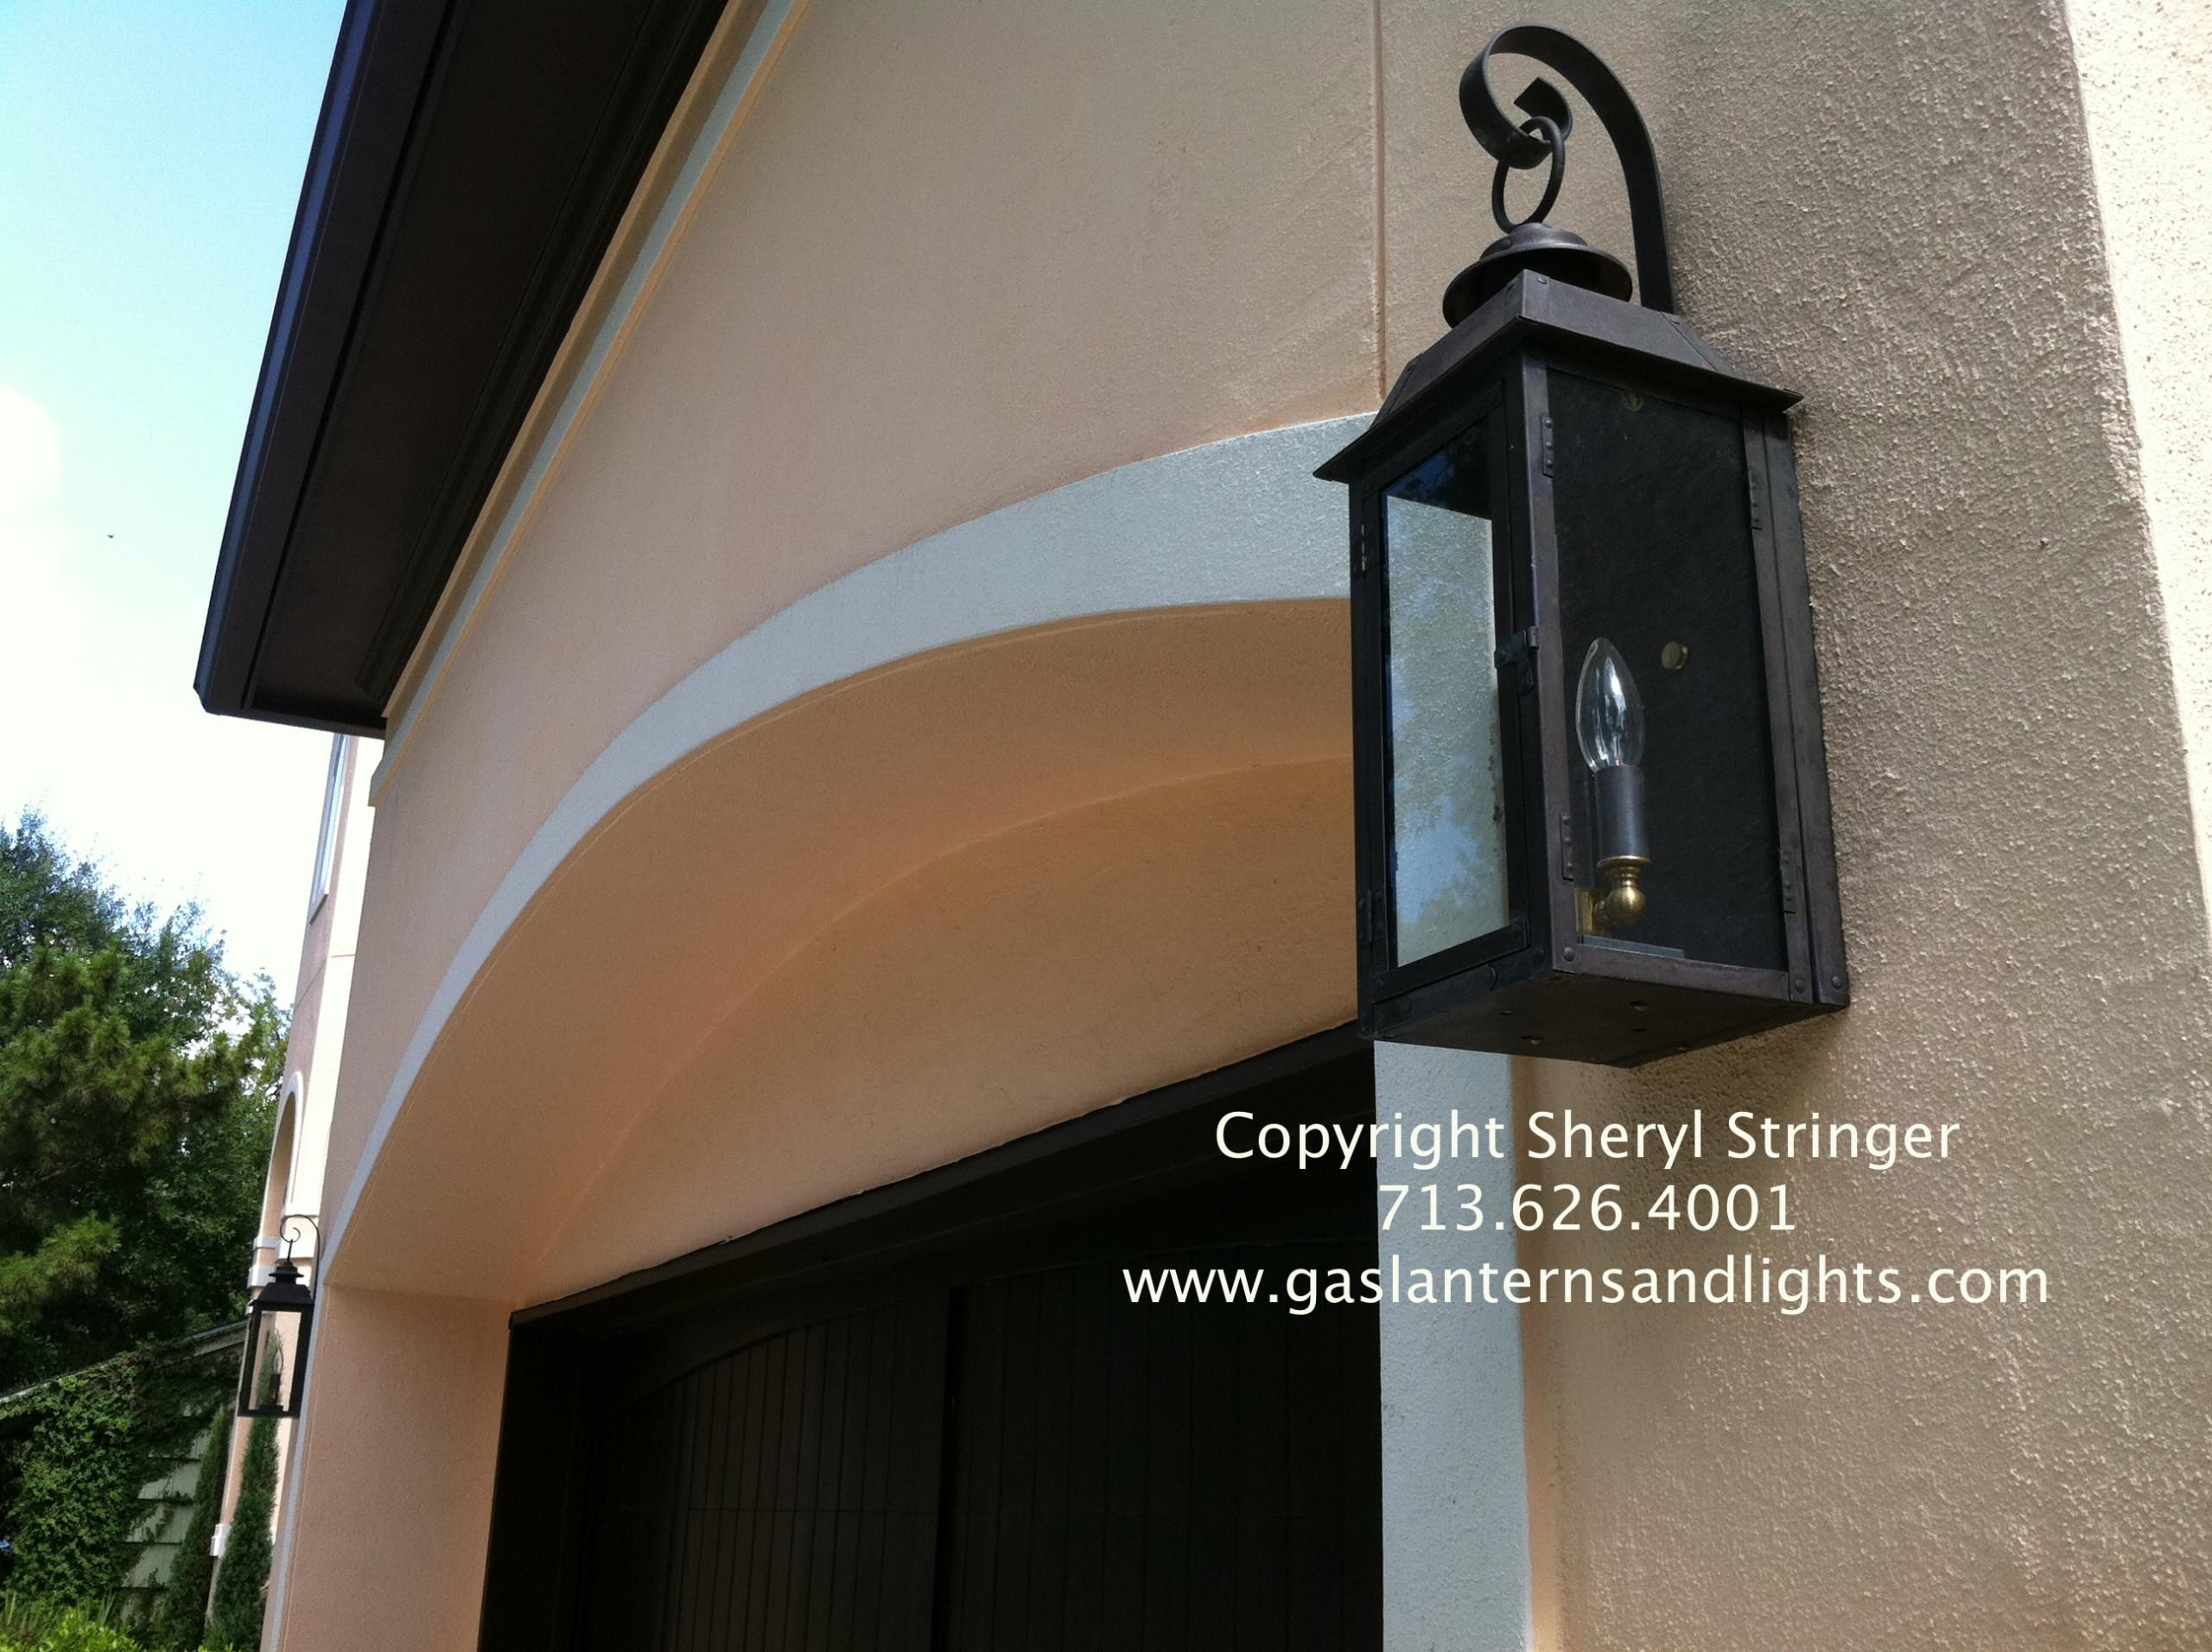 Sheryl's Style 3 Transitional Flush Mount Lanterns by Garage